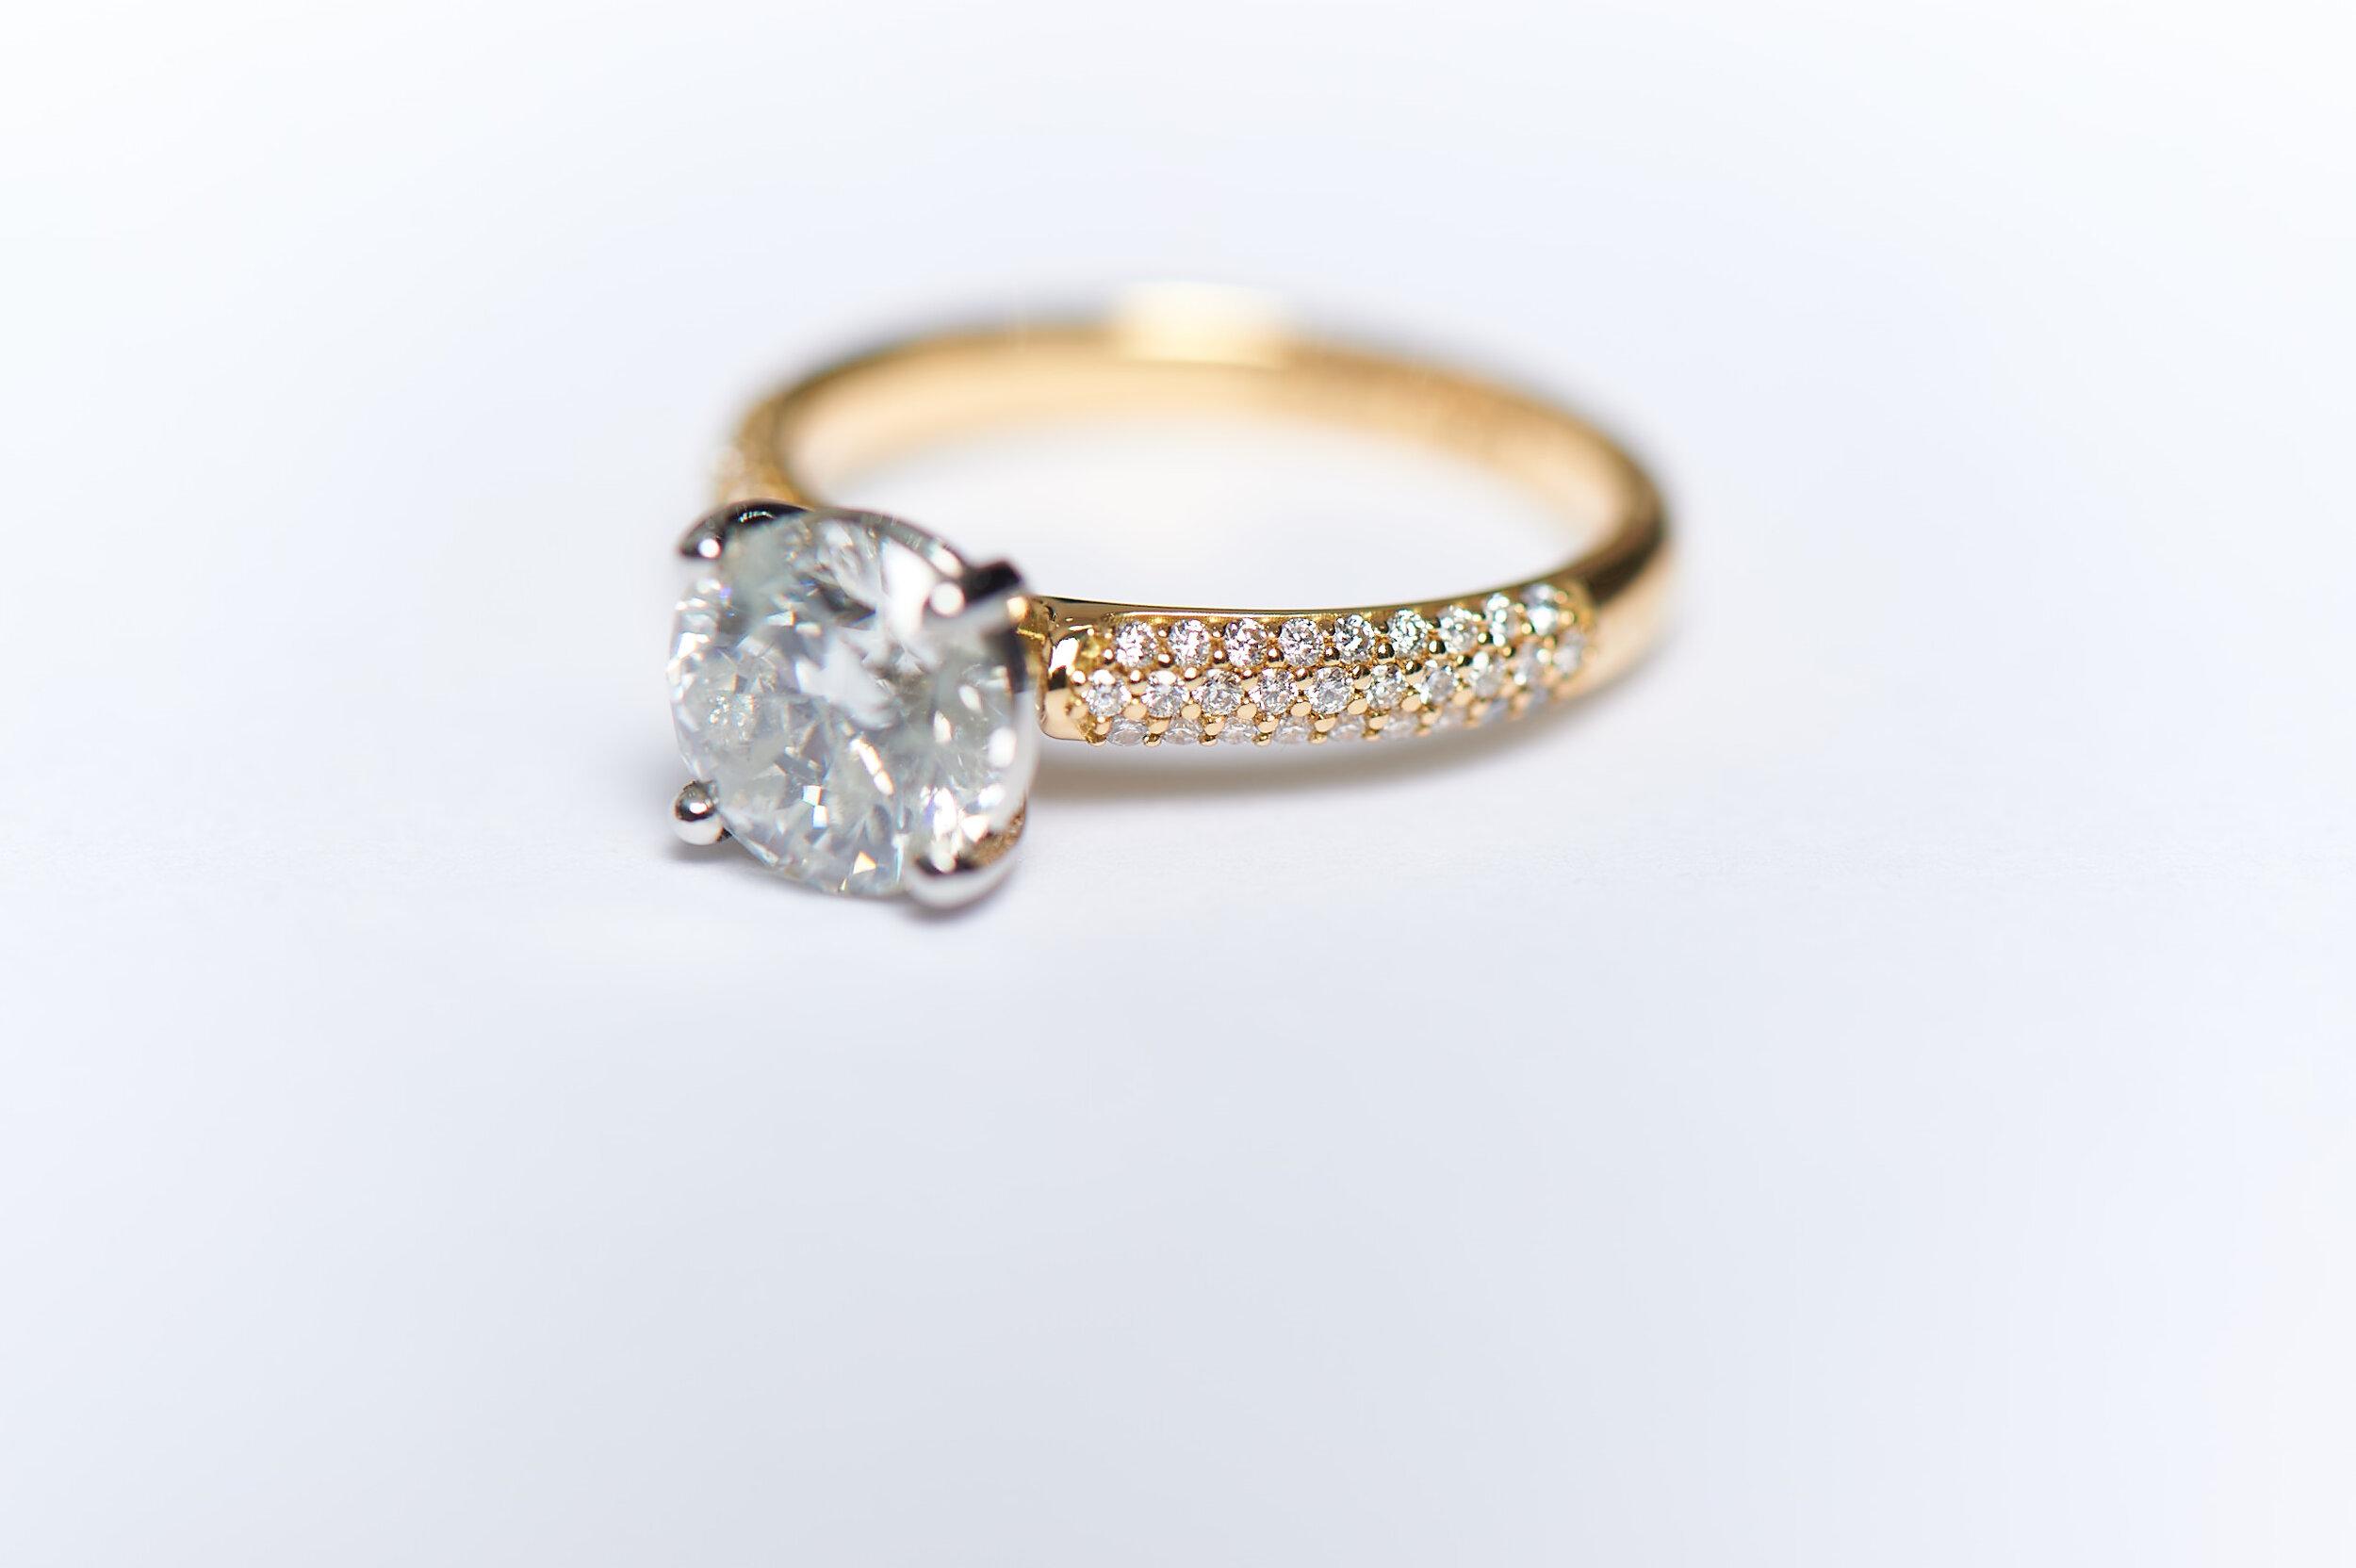 BD_Chris_Stoner_jewellery_109NCD4S_1095.jpg